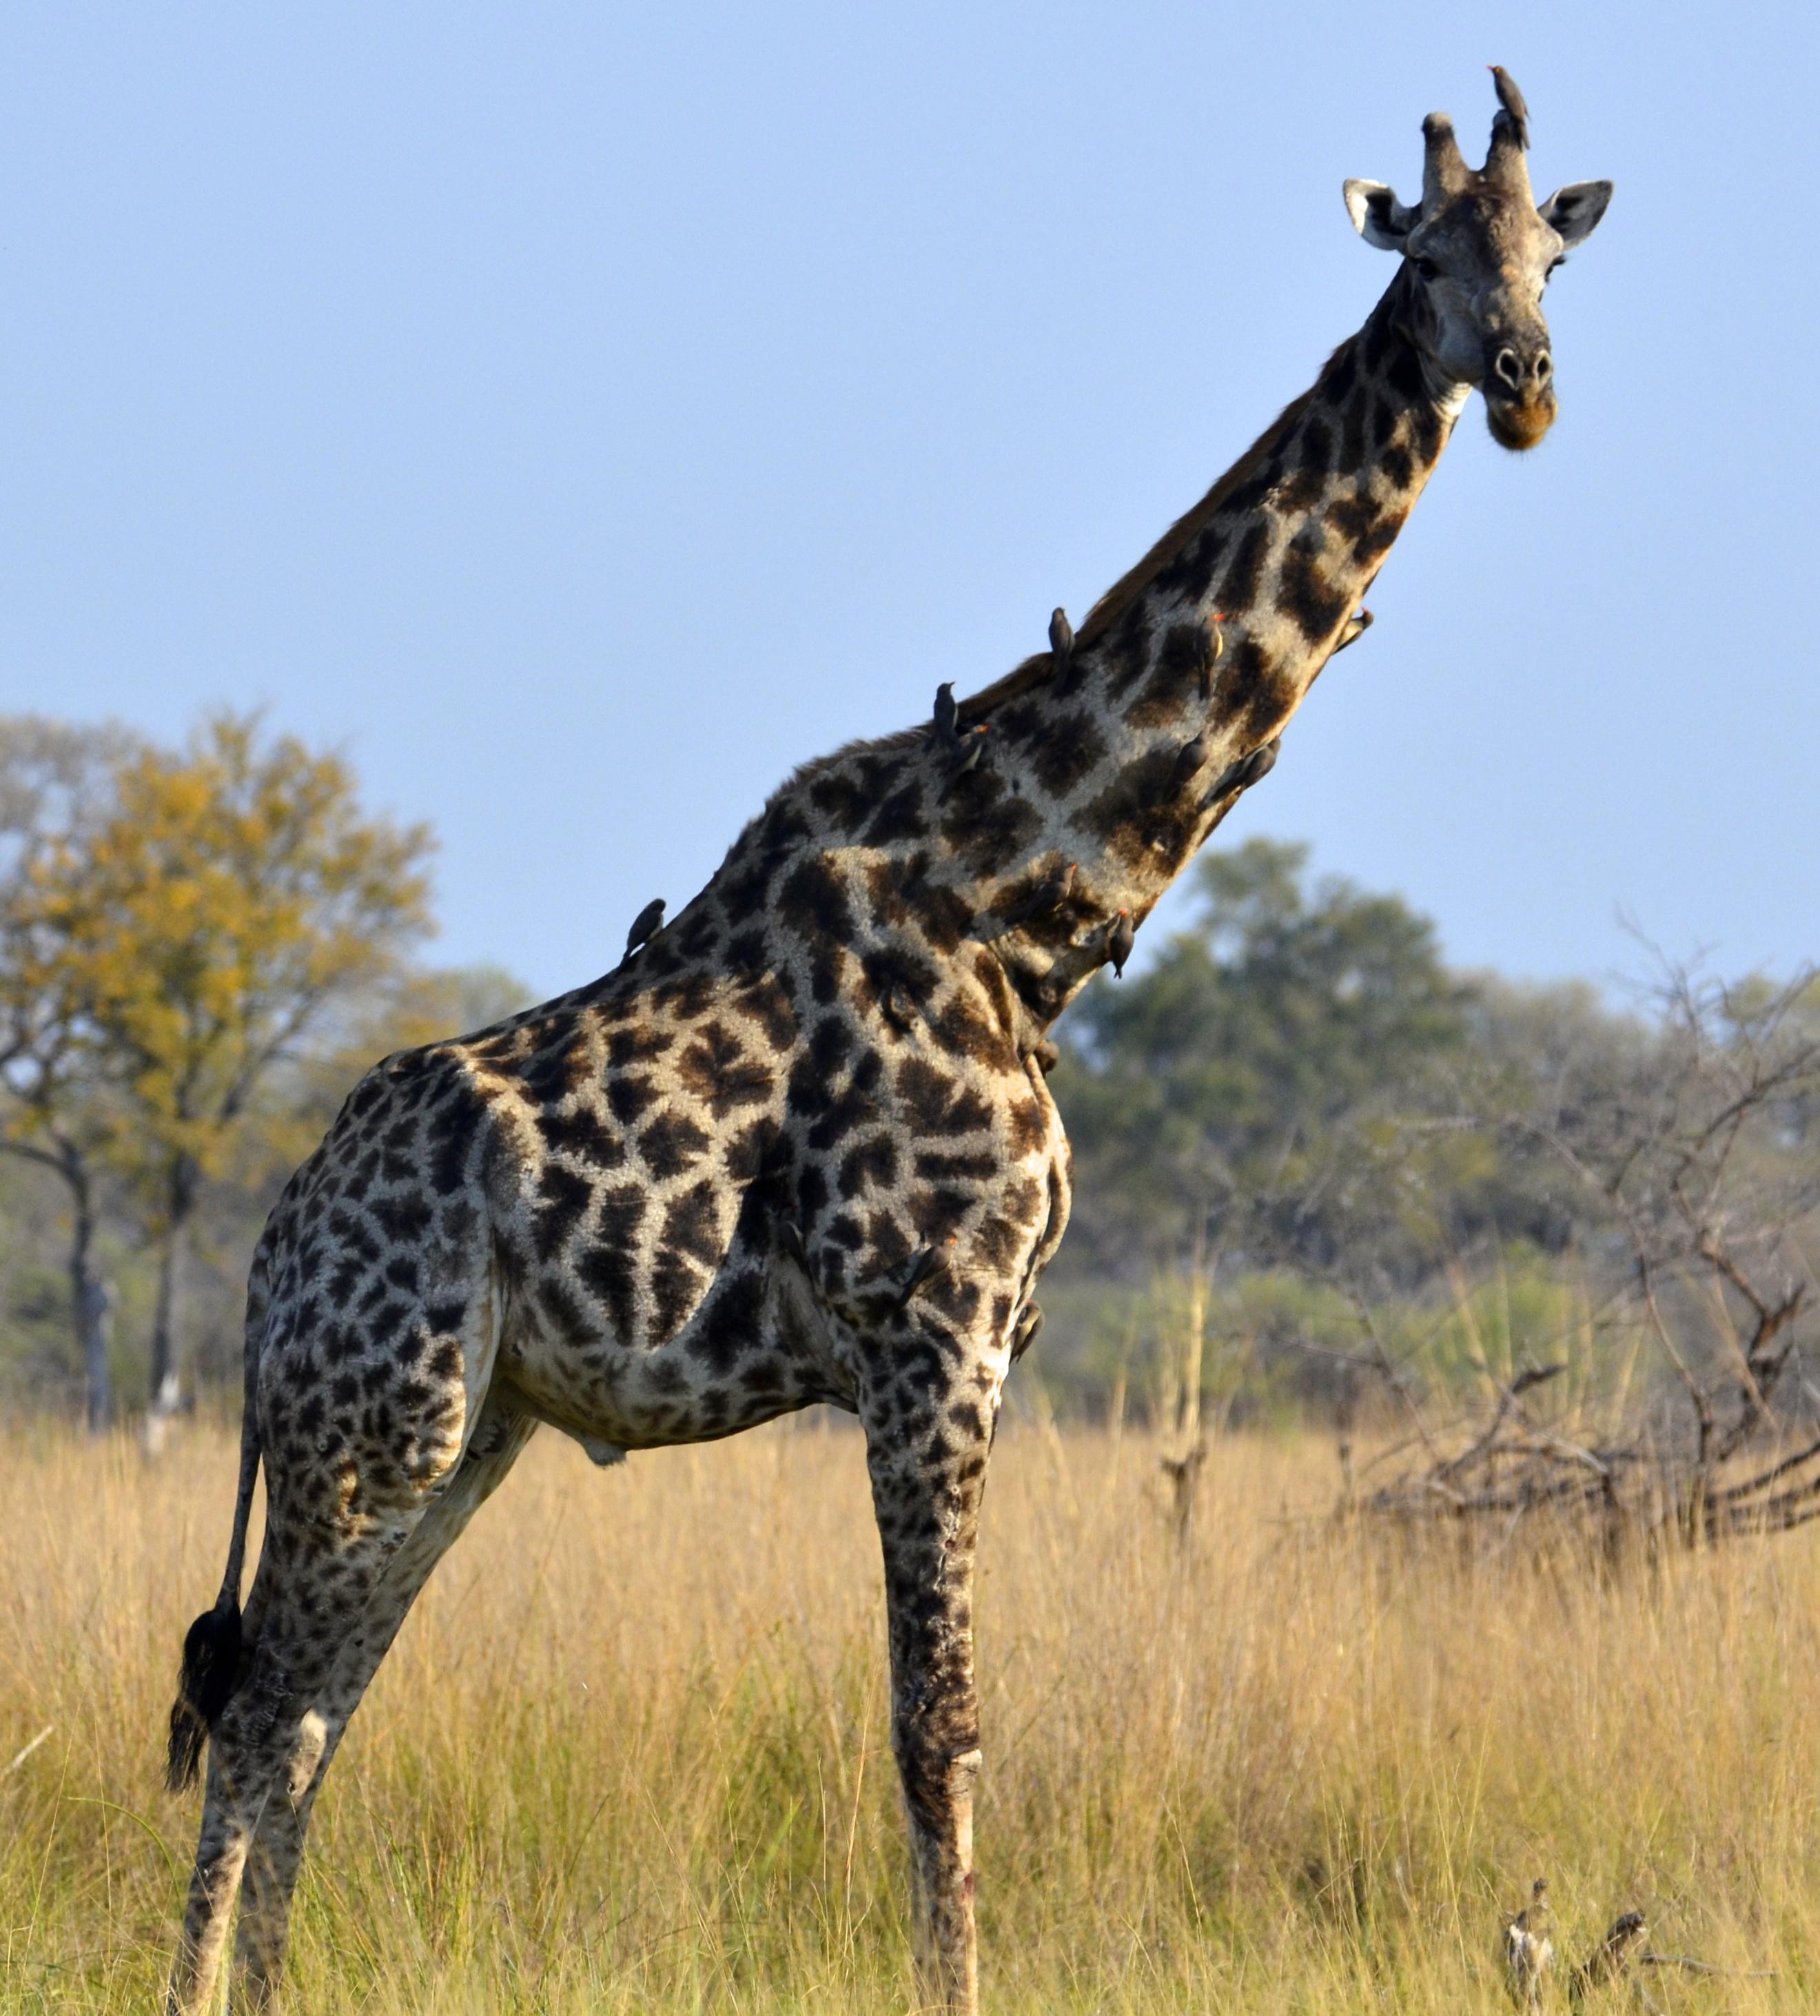 Giraffe A bull South African giraffe